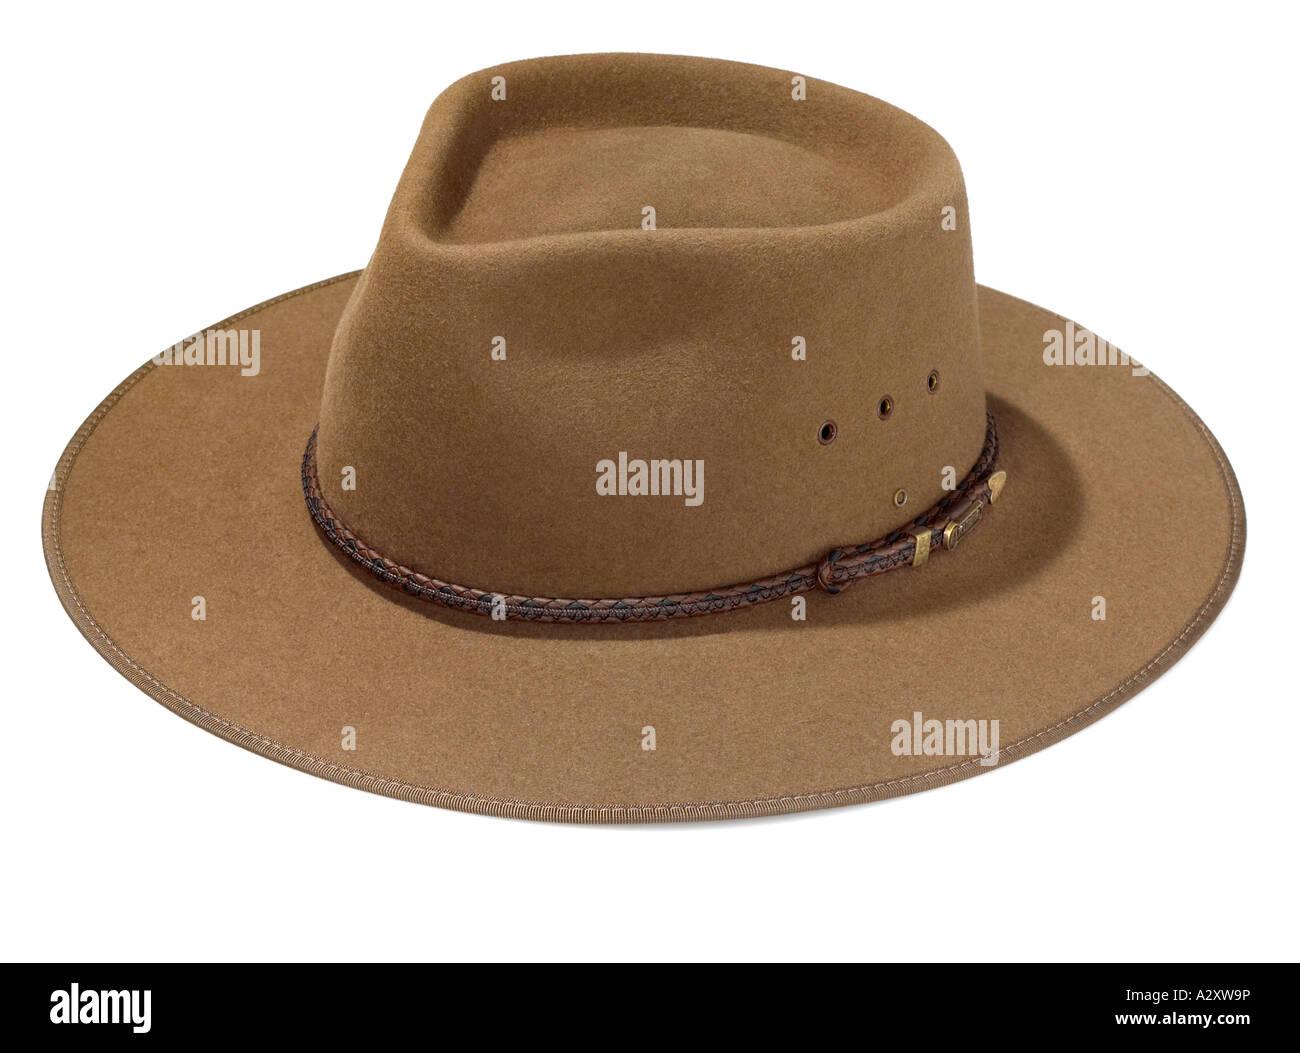 Felt cowboy hat - Stock Image